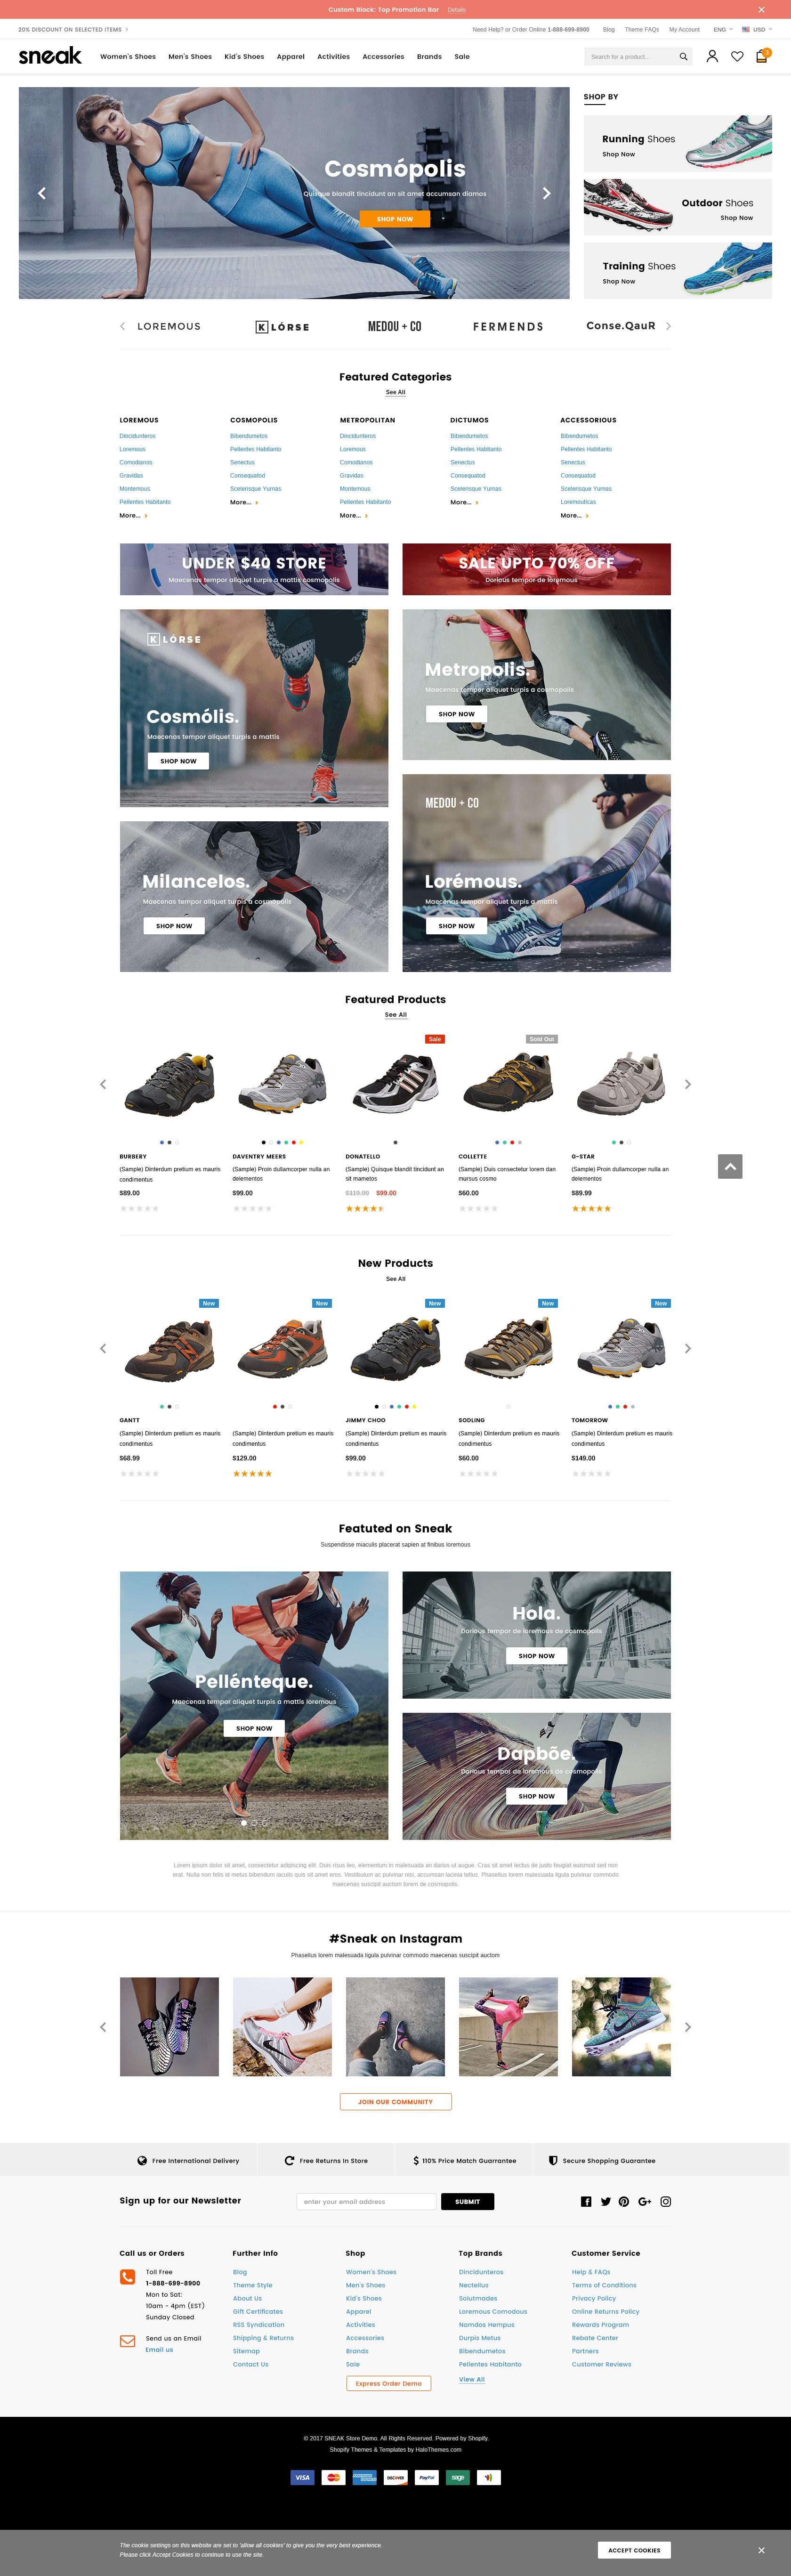 Sneak – Responsive Shoes Shopify Template